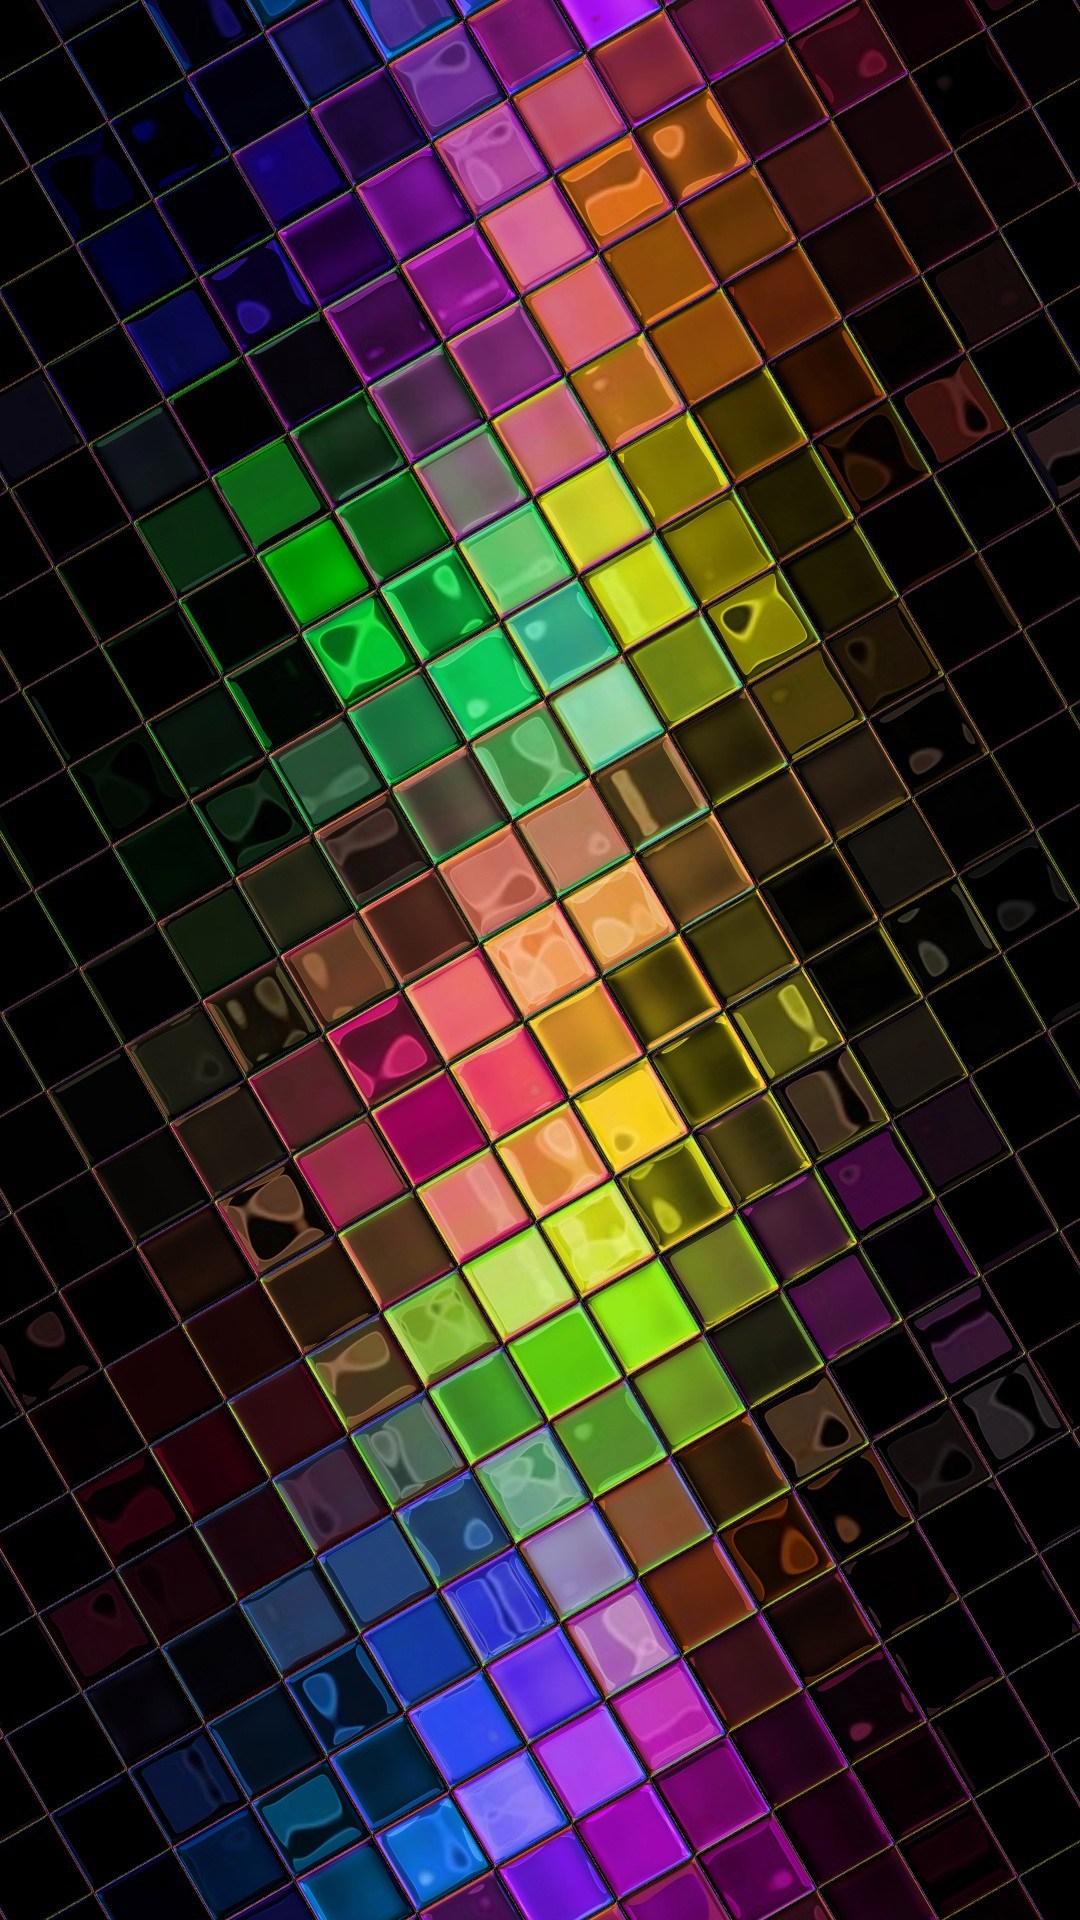 Unduh 2000+ Wallpaper Abyss Iphone 6 Plus HD Terbaru